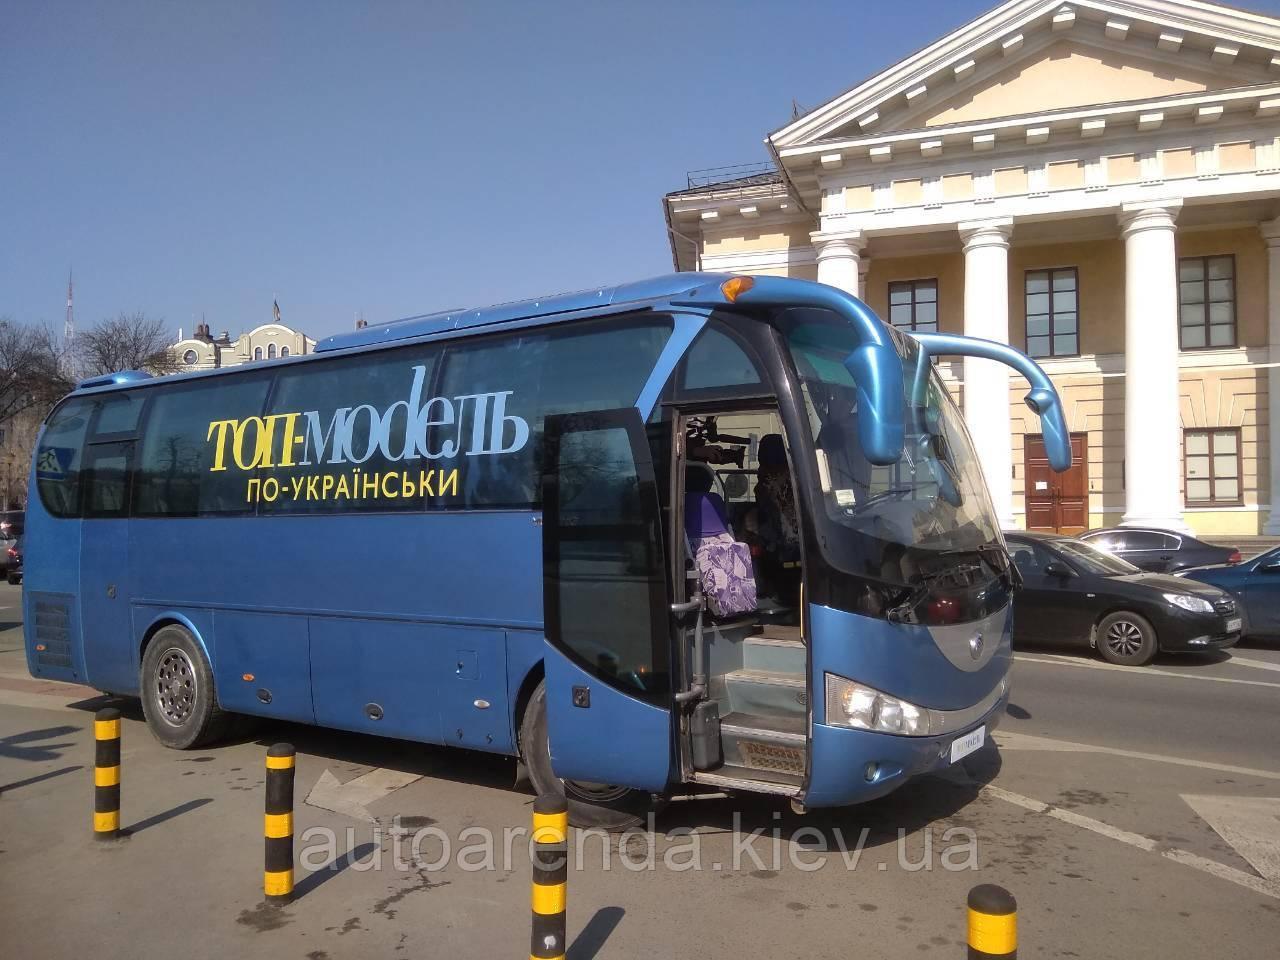 Аренда автобуса ютонг на 30 мест